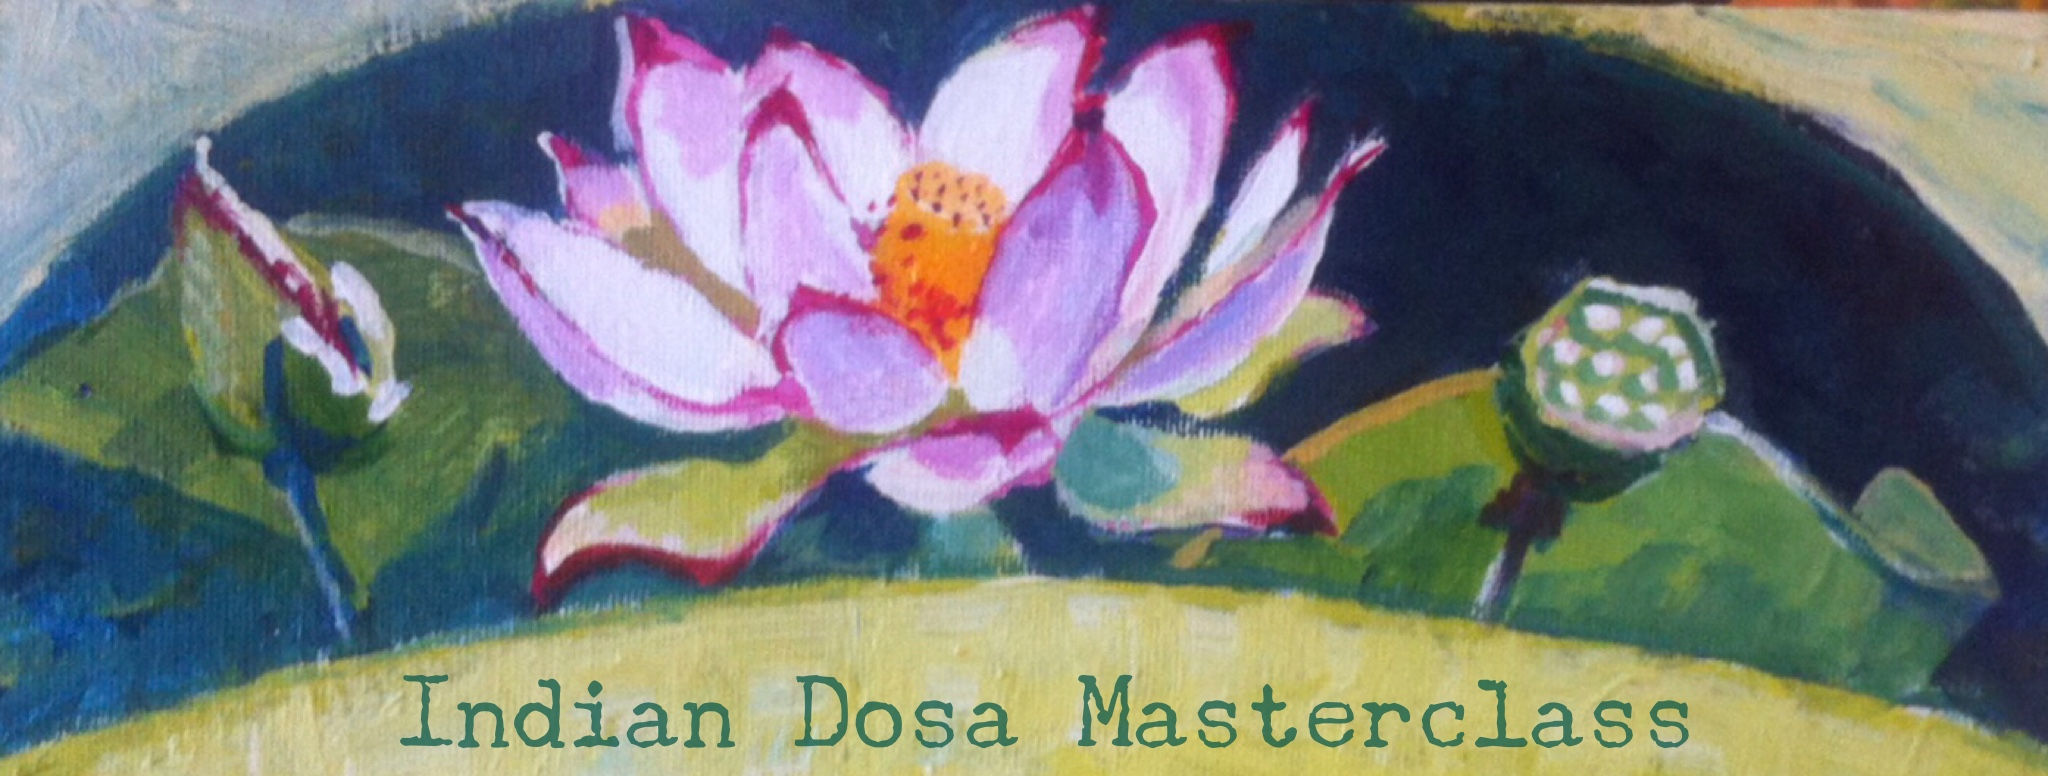 Russell's Dosa Masterclass